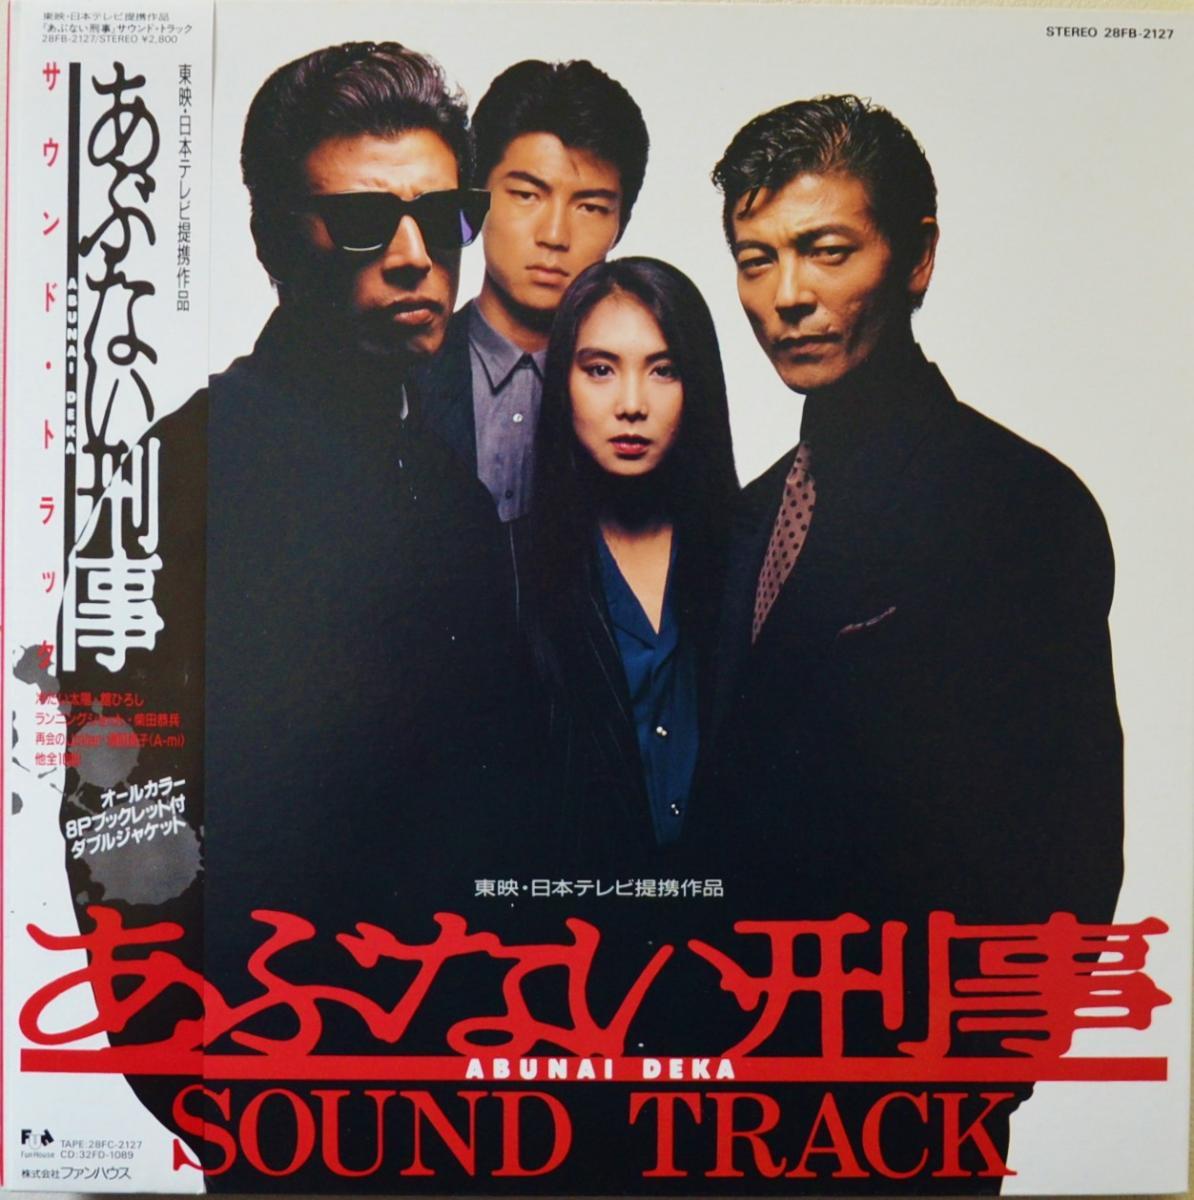 O.S.T. サウンド・トラック (柴田恭平,小山水城) / あぶない刑事 ABUNAI DEKA (LP)